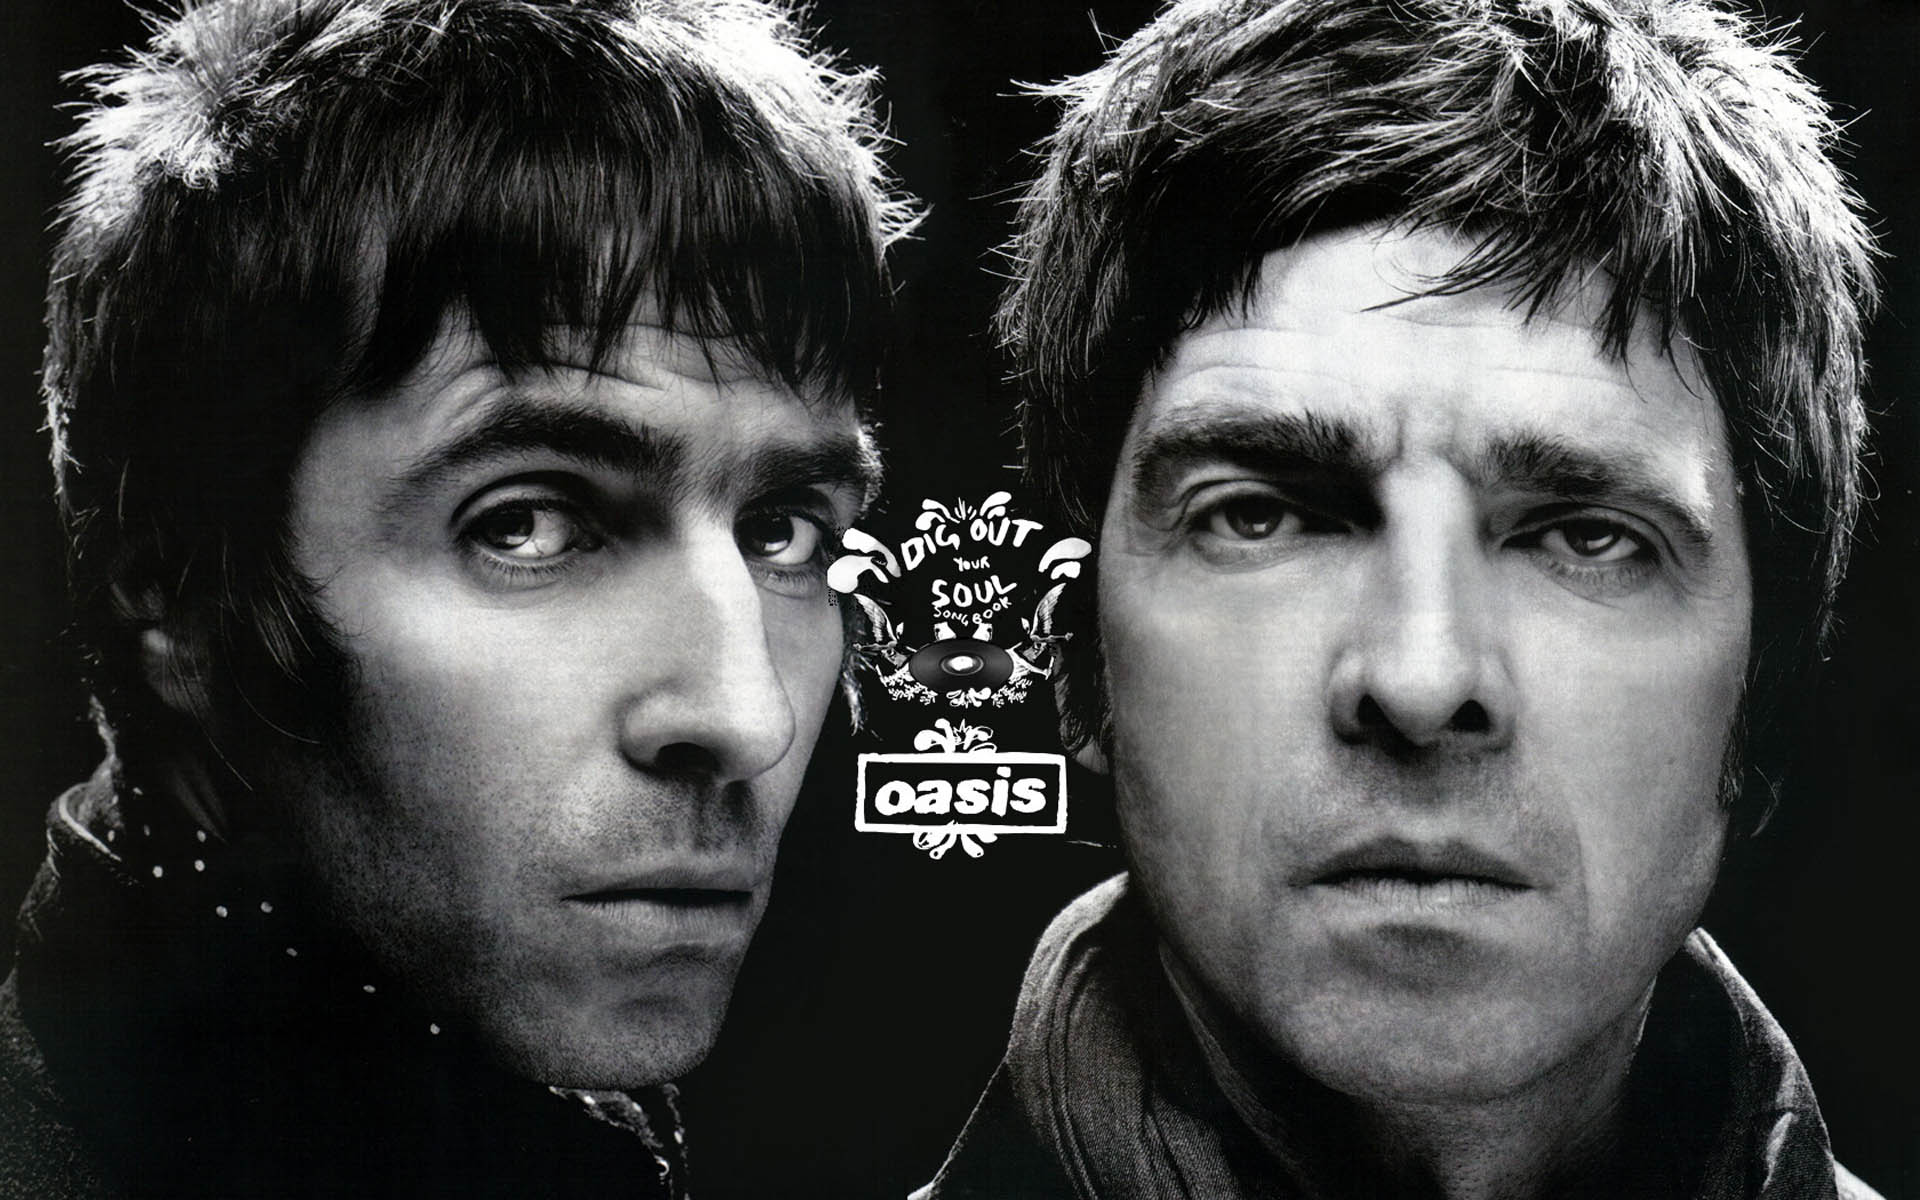 Фото группы Oasis - Oasis Oasis Band Wallpaper